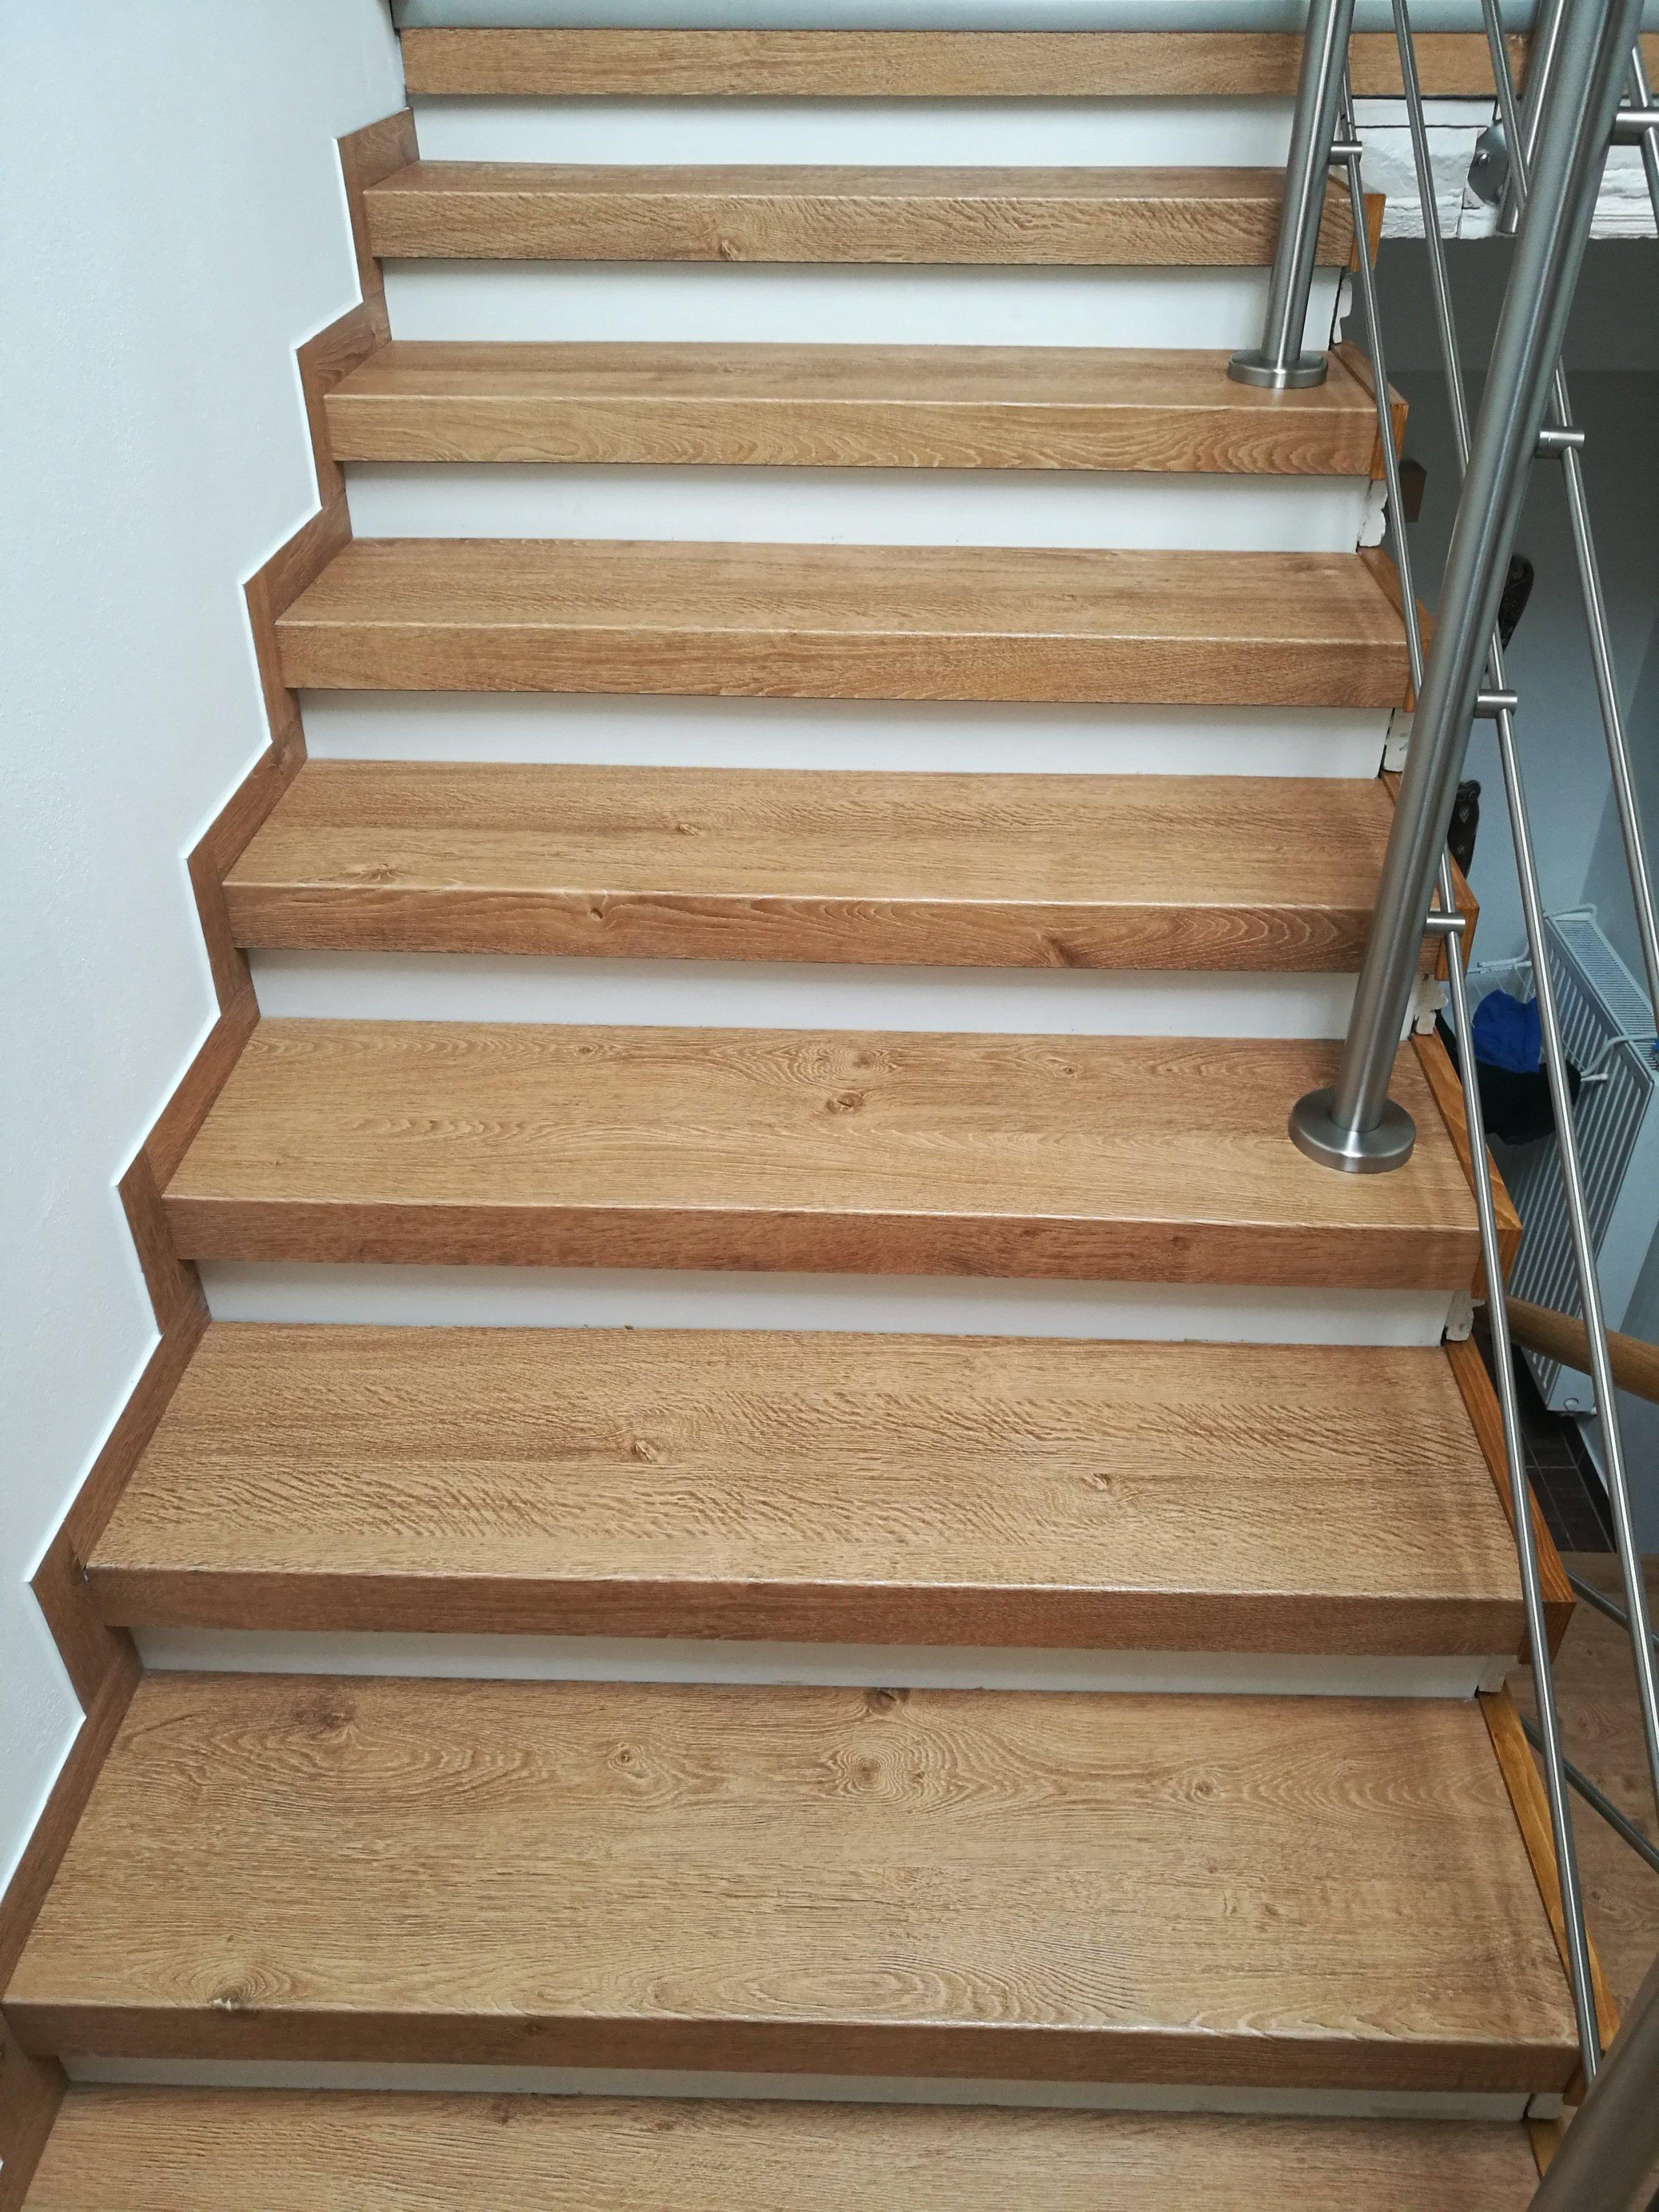 Schodové nášlapy jsou vyrobené z ohnutých dílců vinylové podlahy - dodáno firmou Bukoma